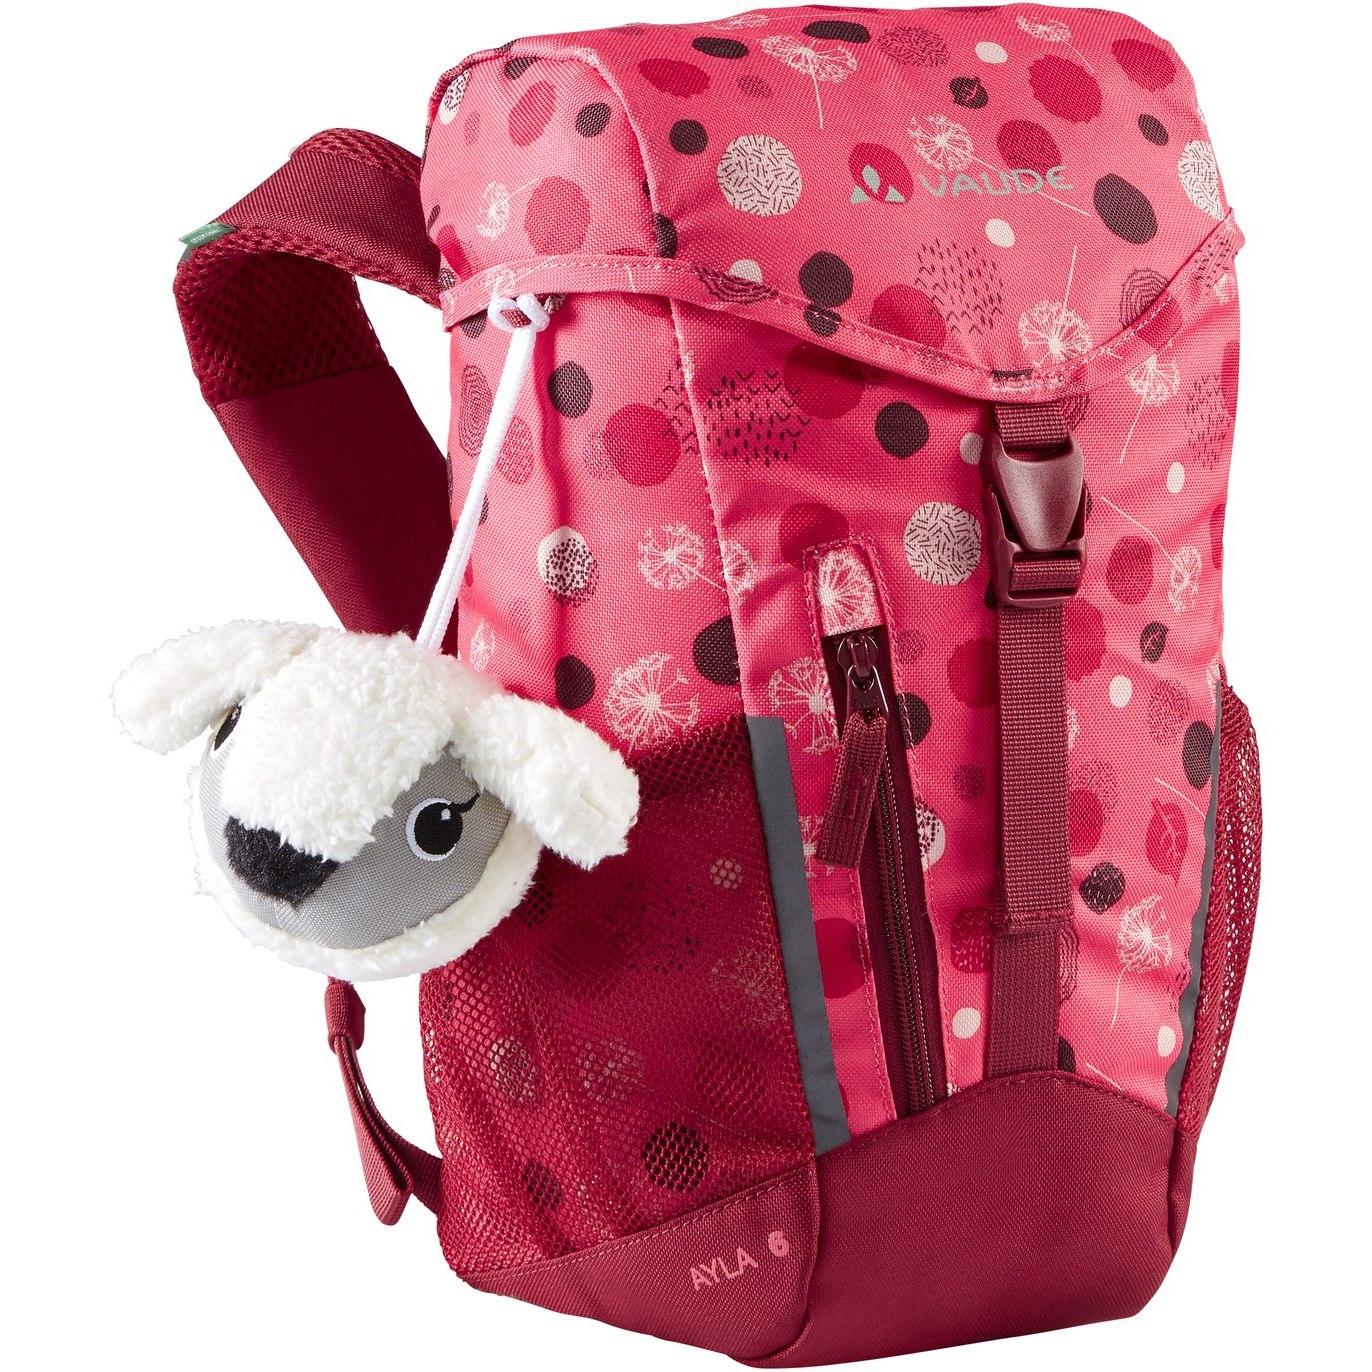 Vaude Ayla 6 Kinder-Rucksack - bright pink/cranberry